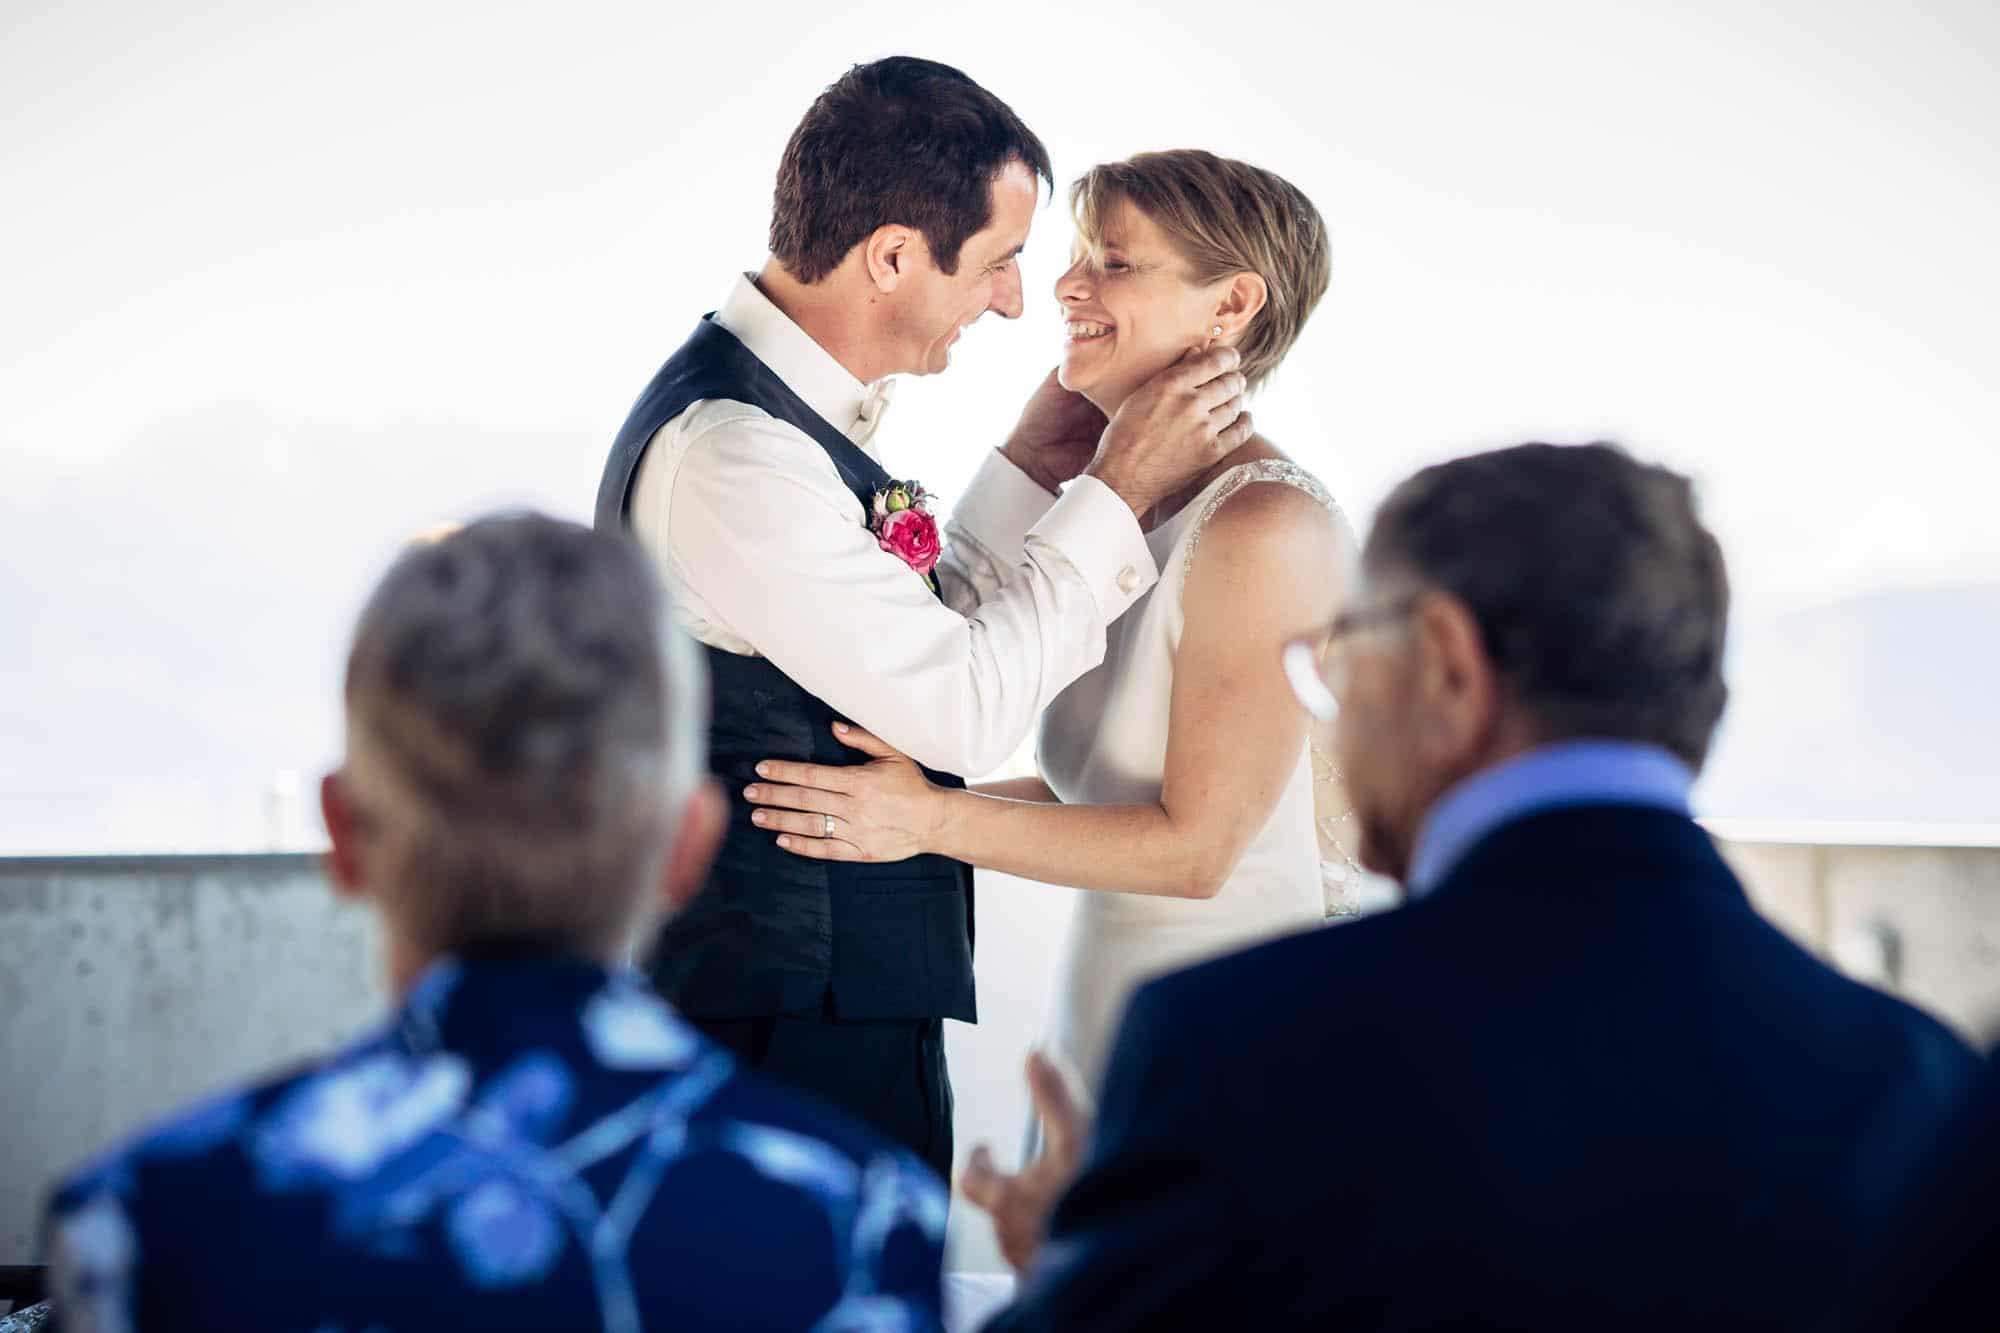 Bräutigam hält Braut um den Hals fest für den Kuss